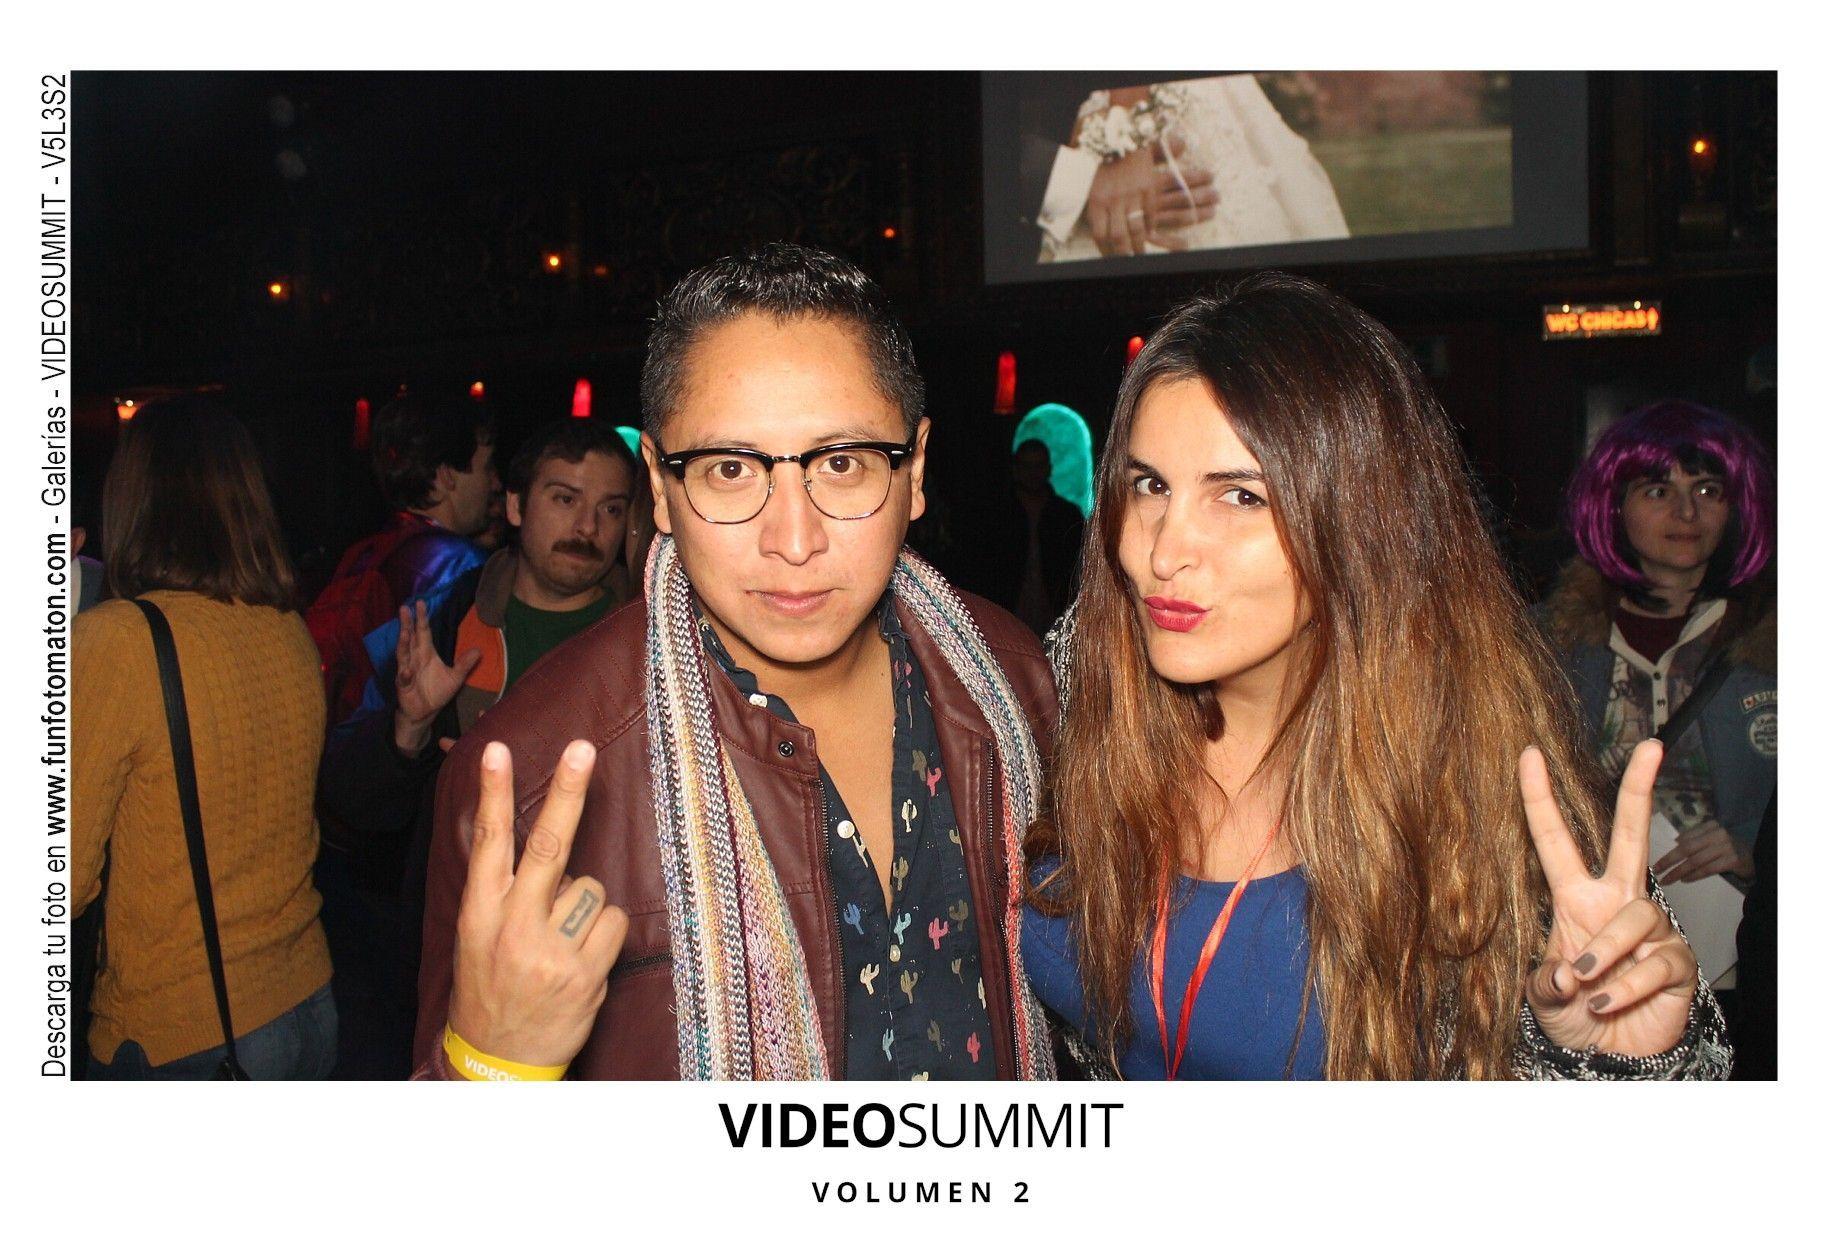 videosummit-vol2-club-party-016